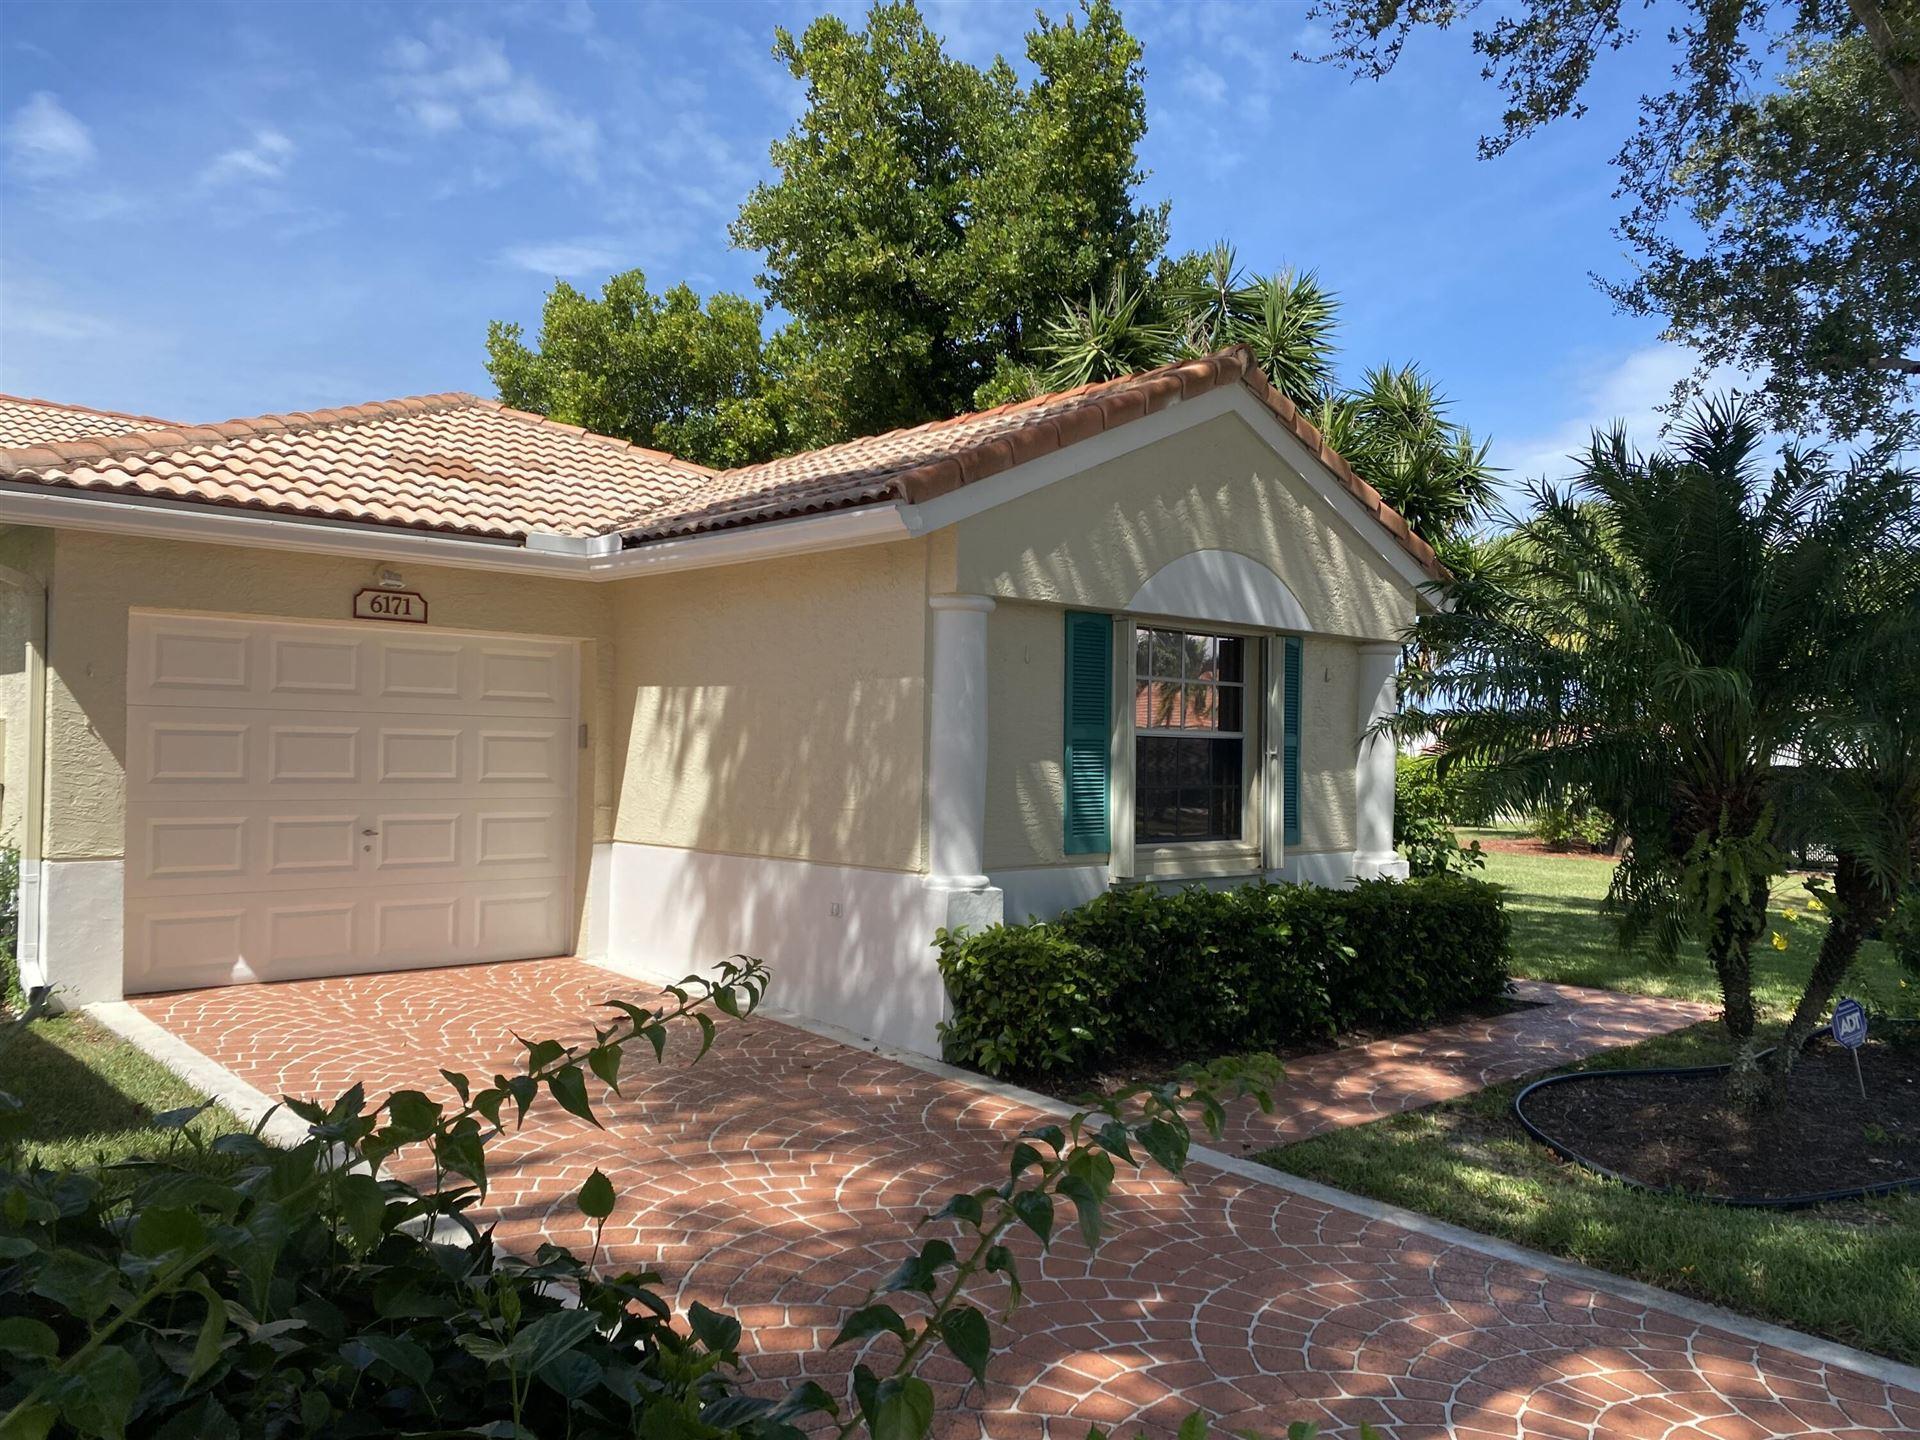 6171 Floral Lakes Drive, Delray Beach, FL 33484 - MLS#: RX-10741592